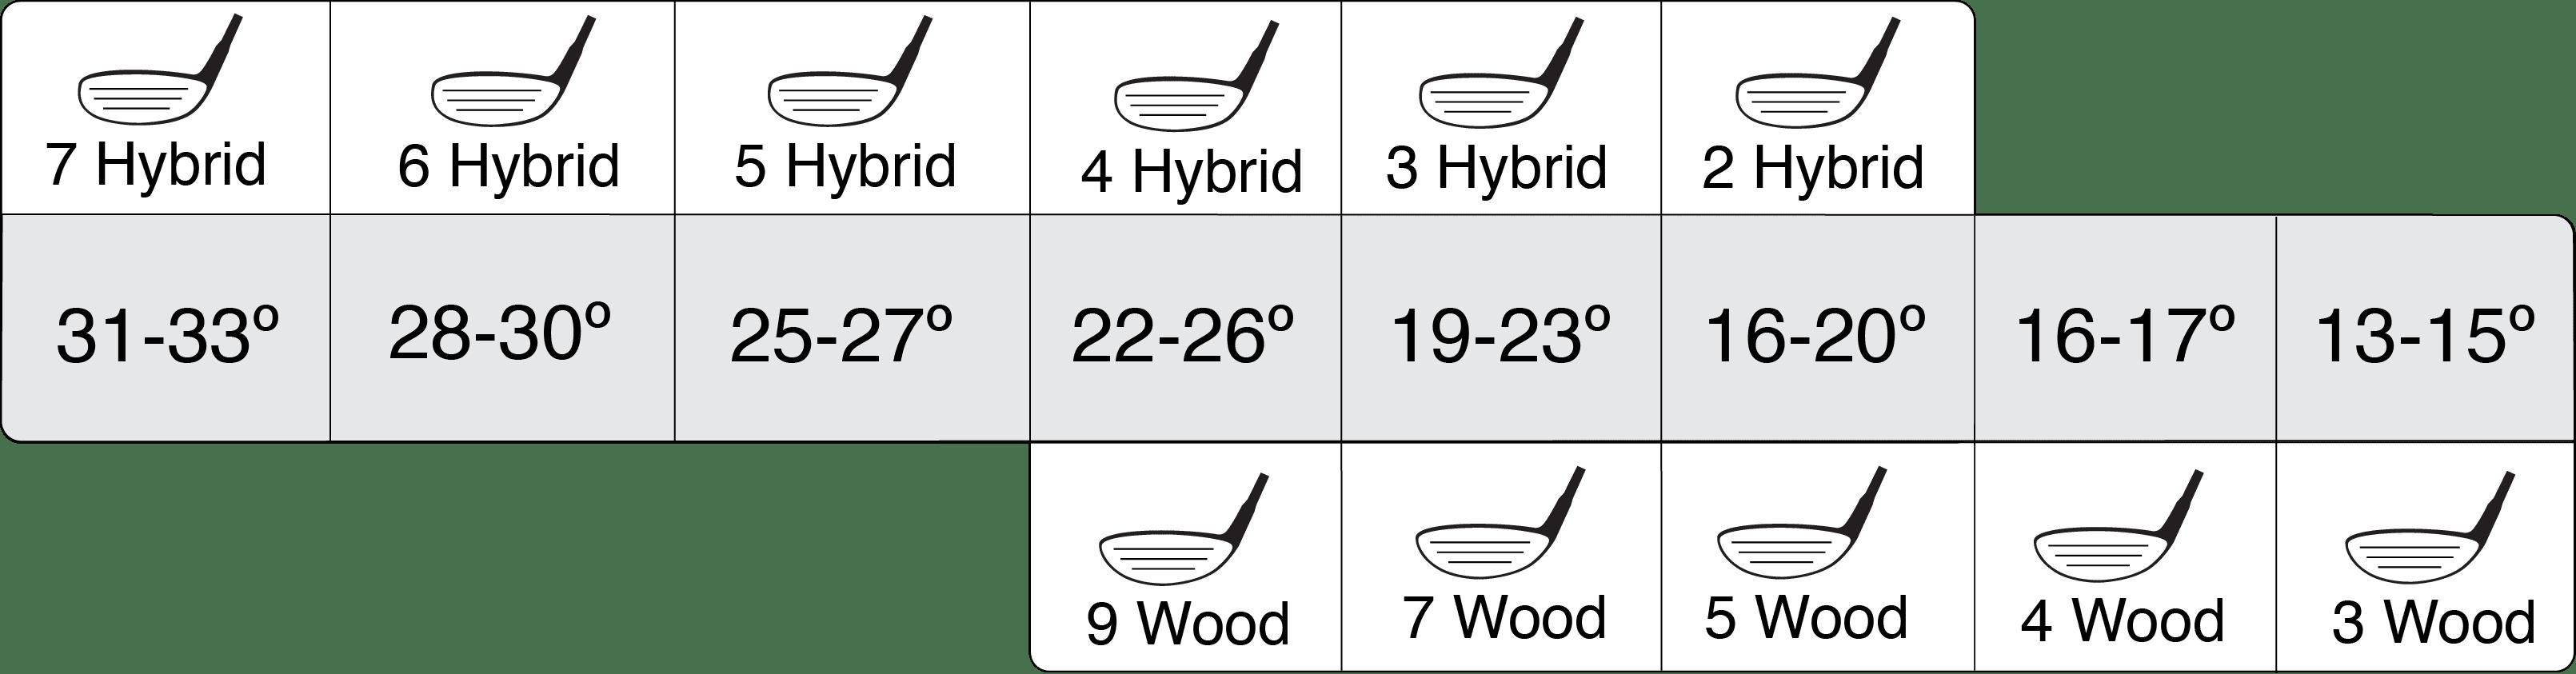 Loft Size Overling 22 26 Degree 9 Wood 4 Hybrid 19 23 7 3 16 20 5 2